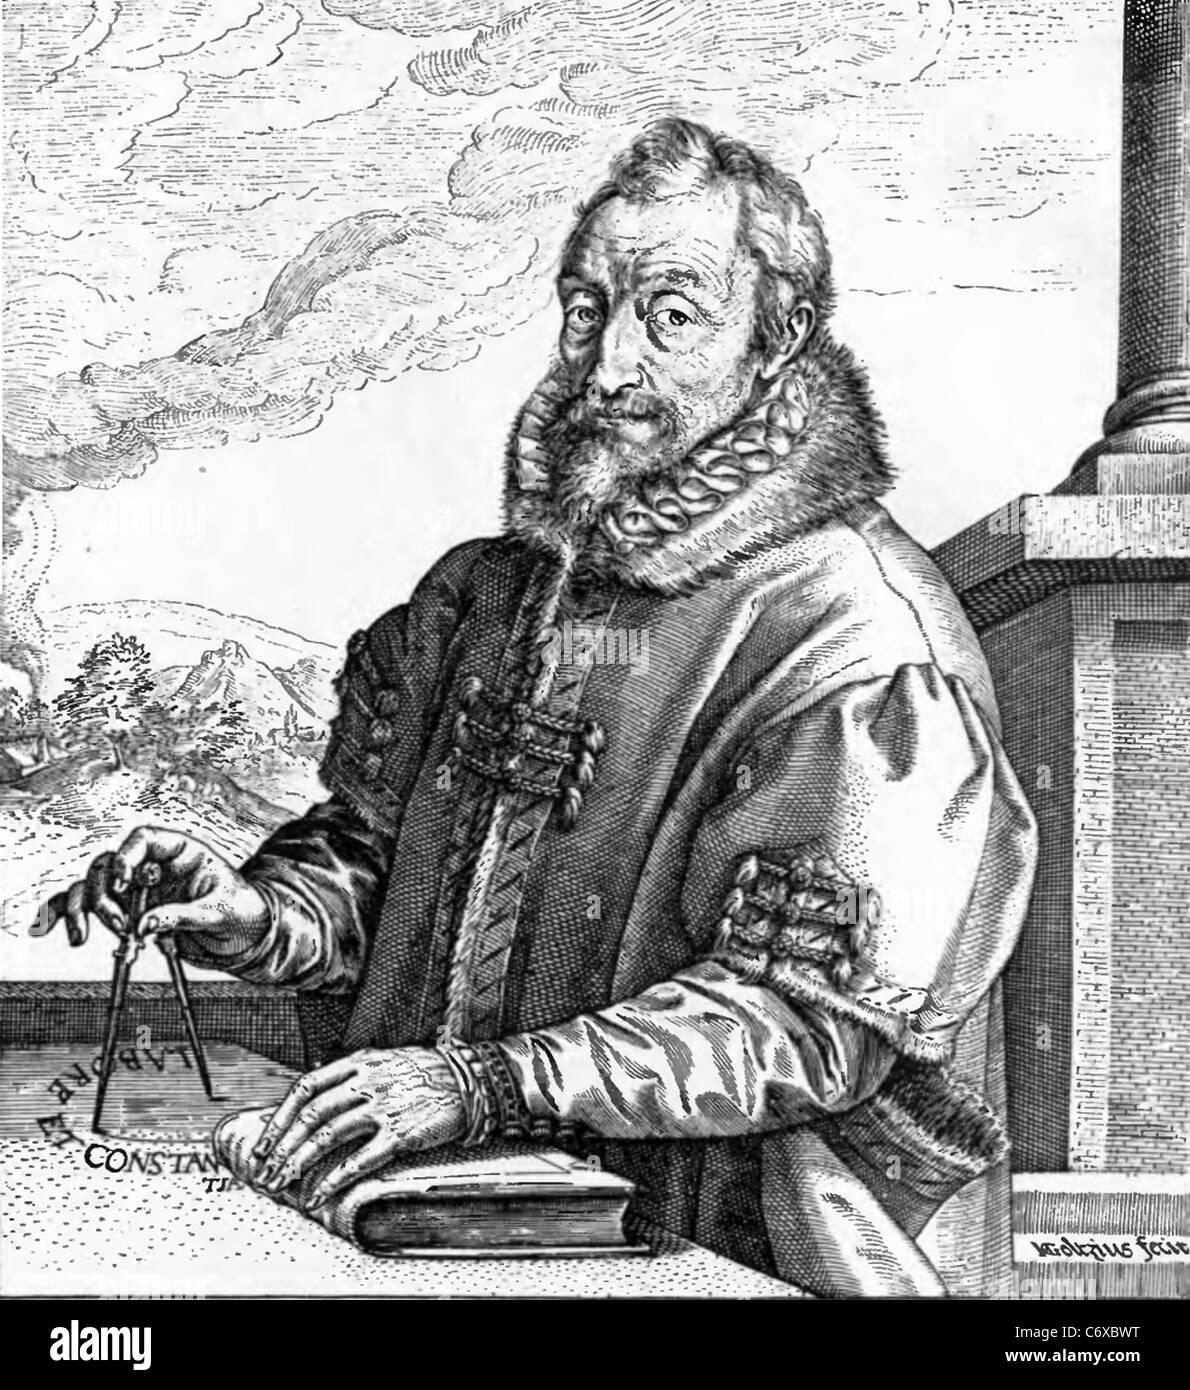 HENDRICK GOLTZIUS (1558-1617) Dutch printmaker and engraver - Stock Image